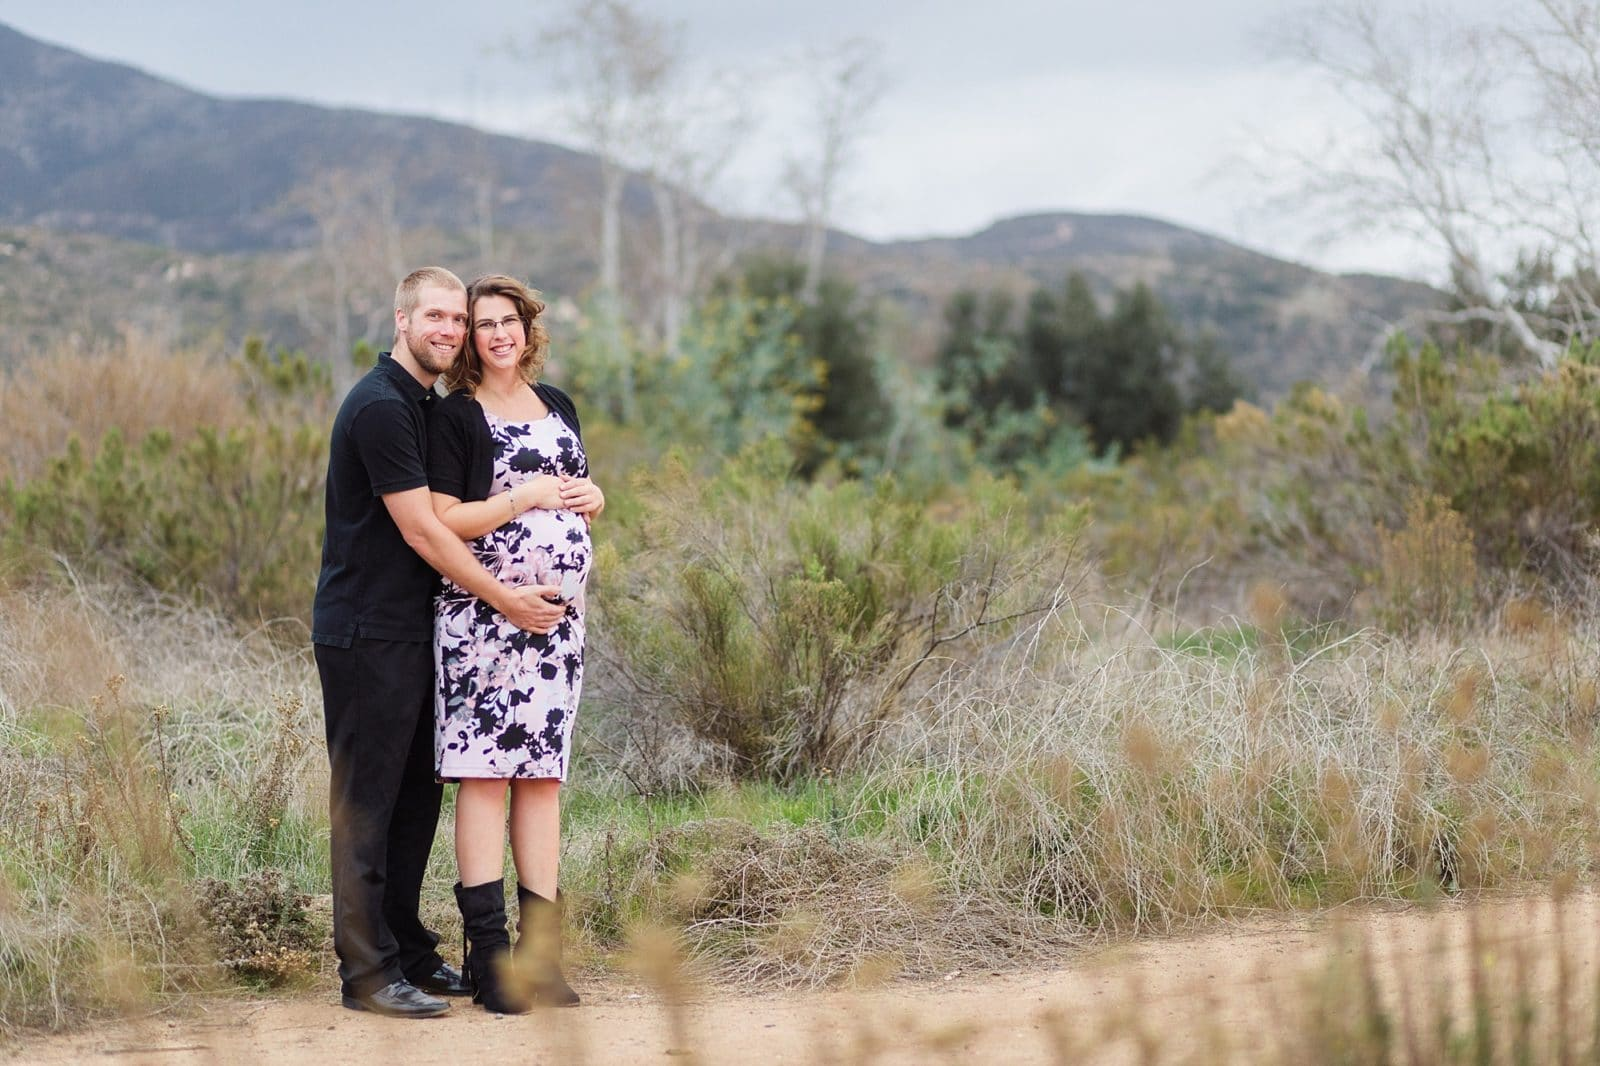 San Diego Pregnancy Photos | San Diego Photographers